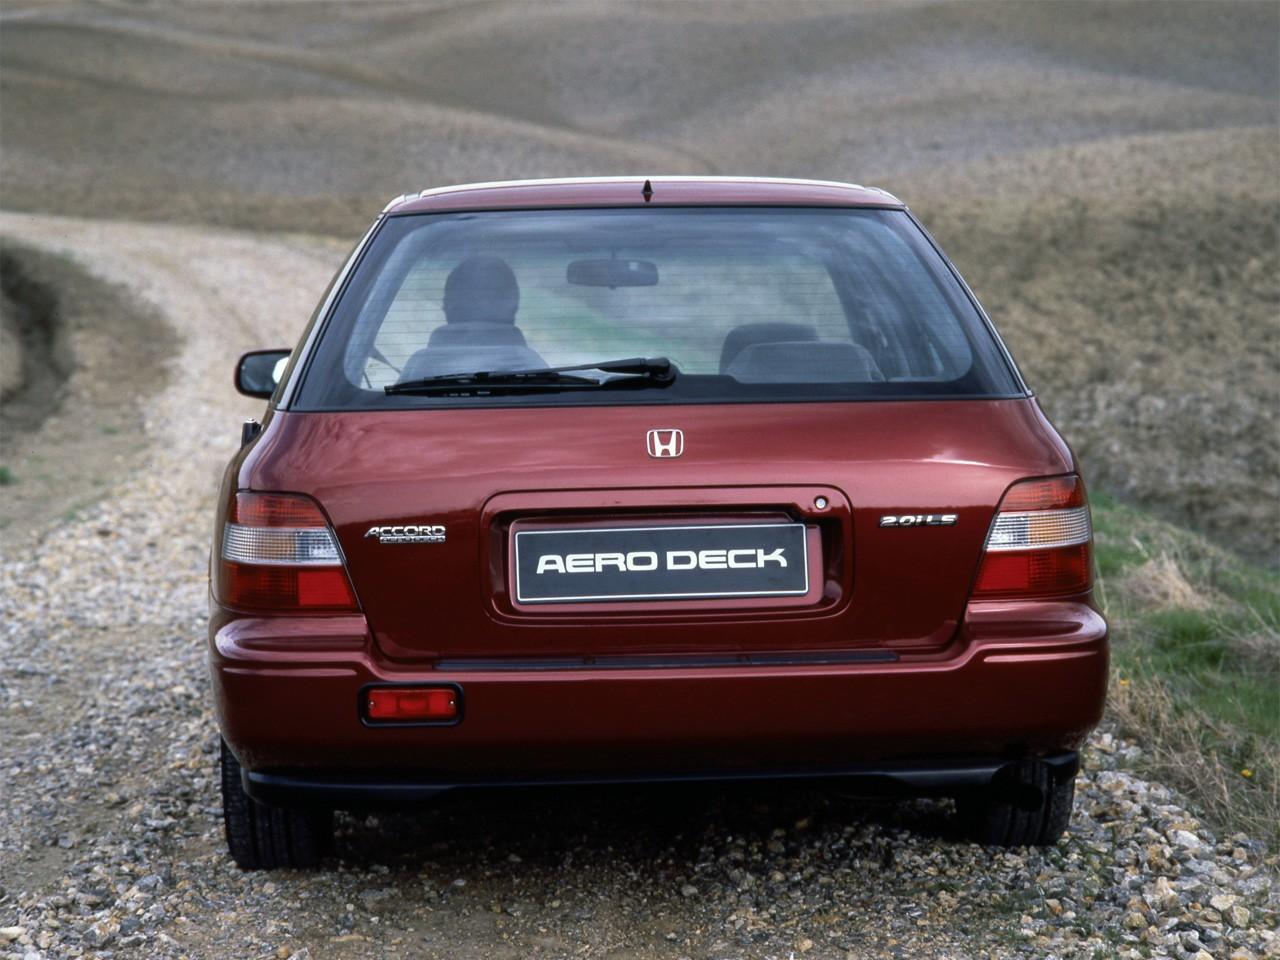 HONDA Accord Aerodeck specs - 1993, 1994 - autoevolution